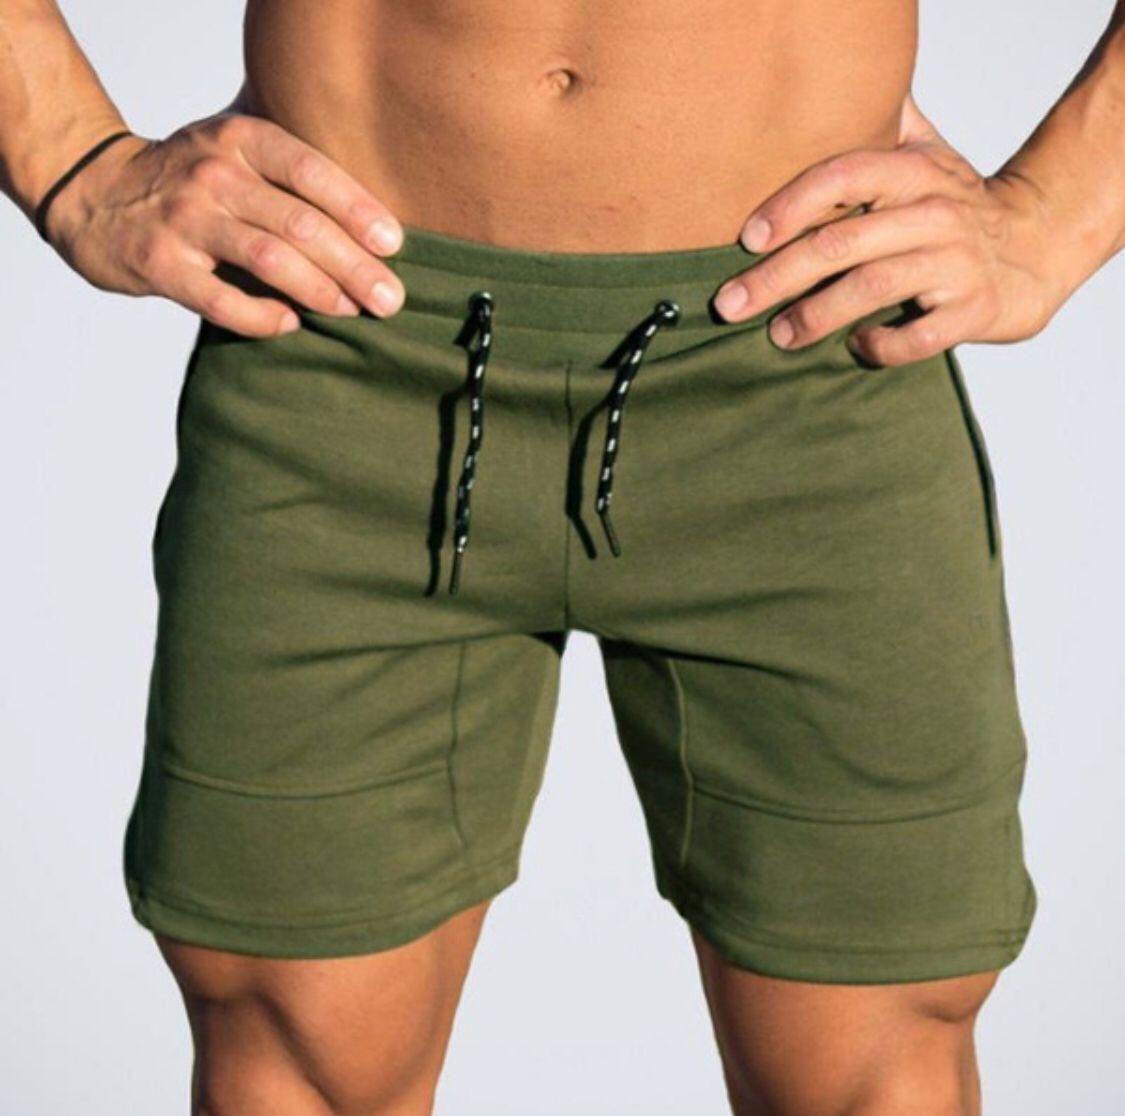 2f2aef6b94 Beach Shorts for Mens Clothing Casual Sports Summer Board Swimwear Shorts  Clothes Hombres Mens Board Shorts Beach Shorts for Mens Mens Swimwear Shorts  ...